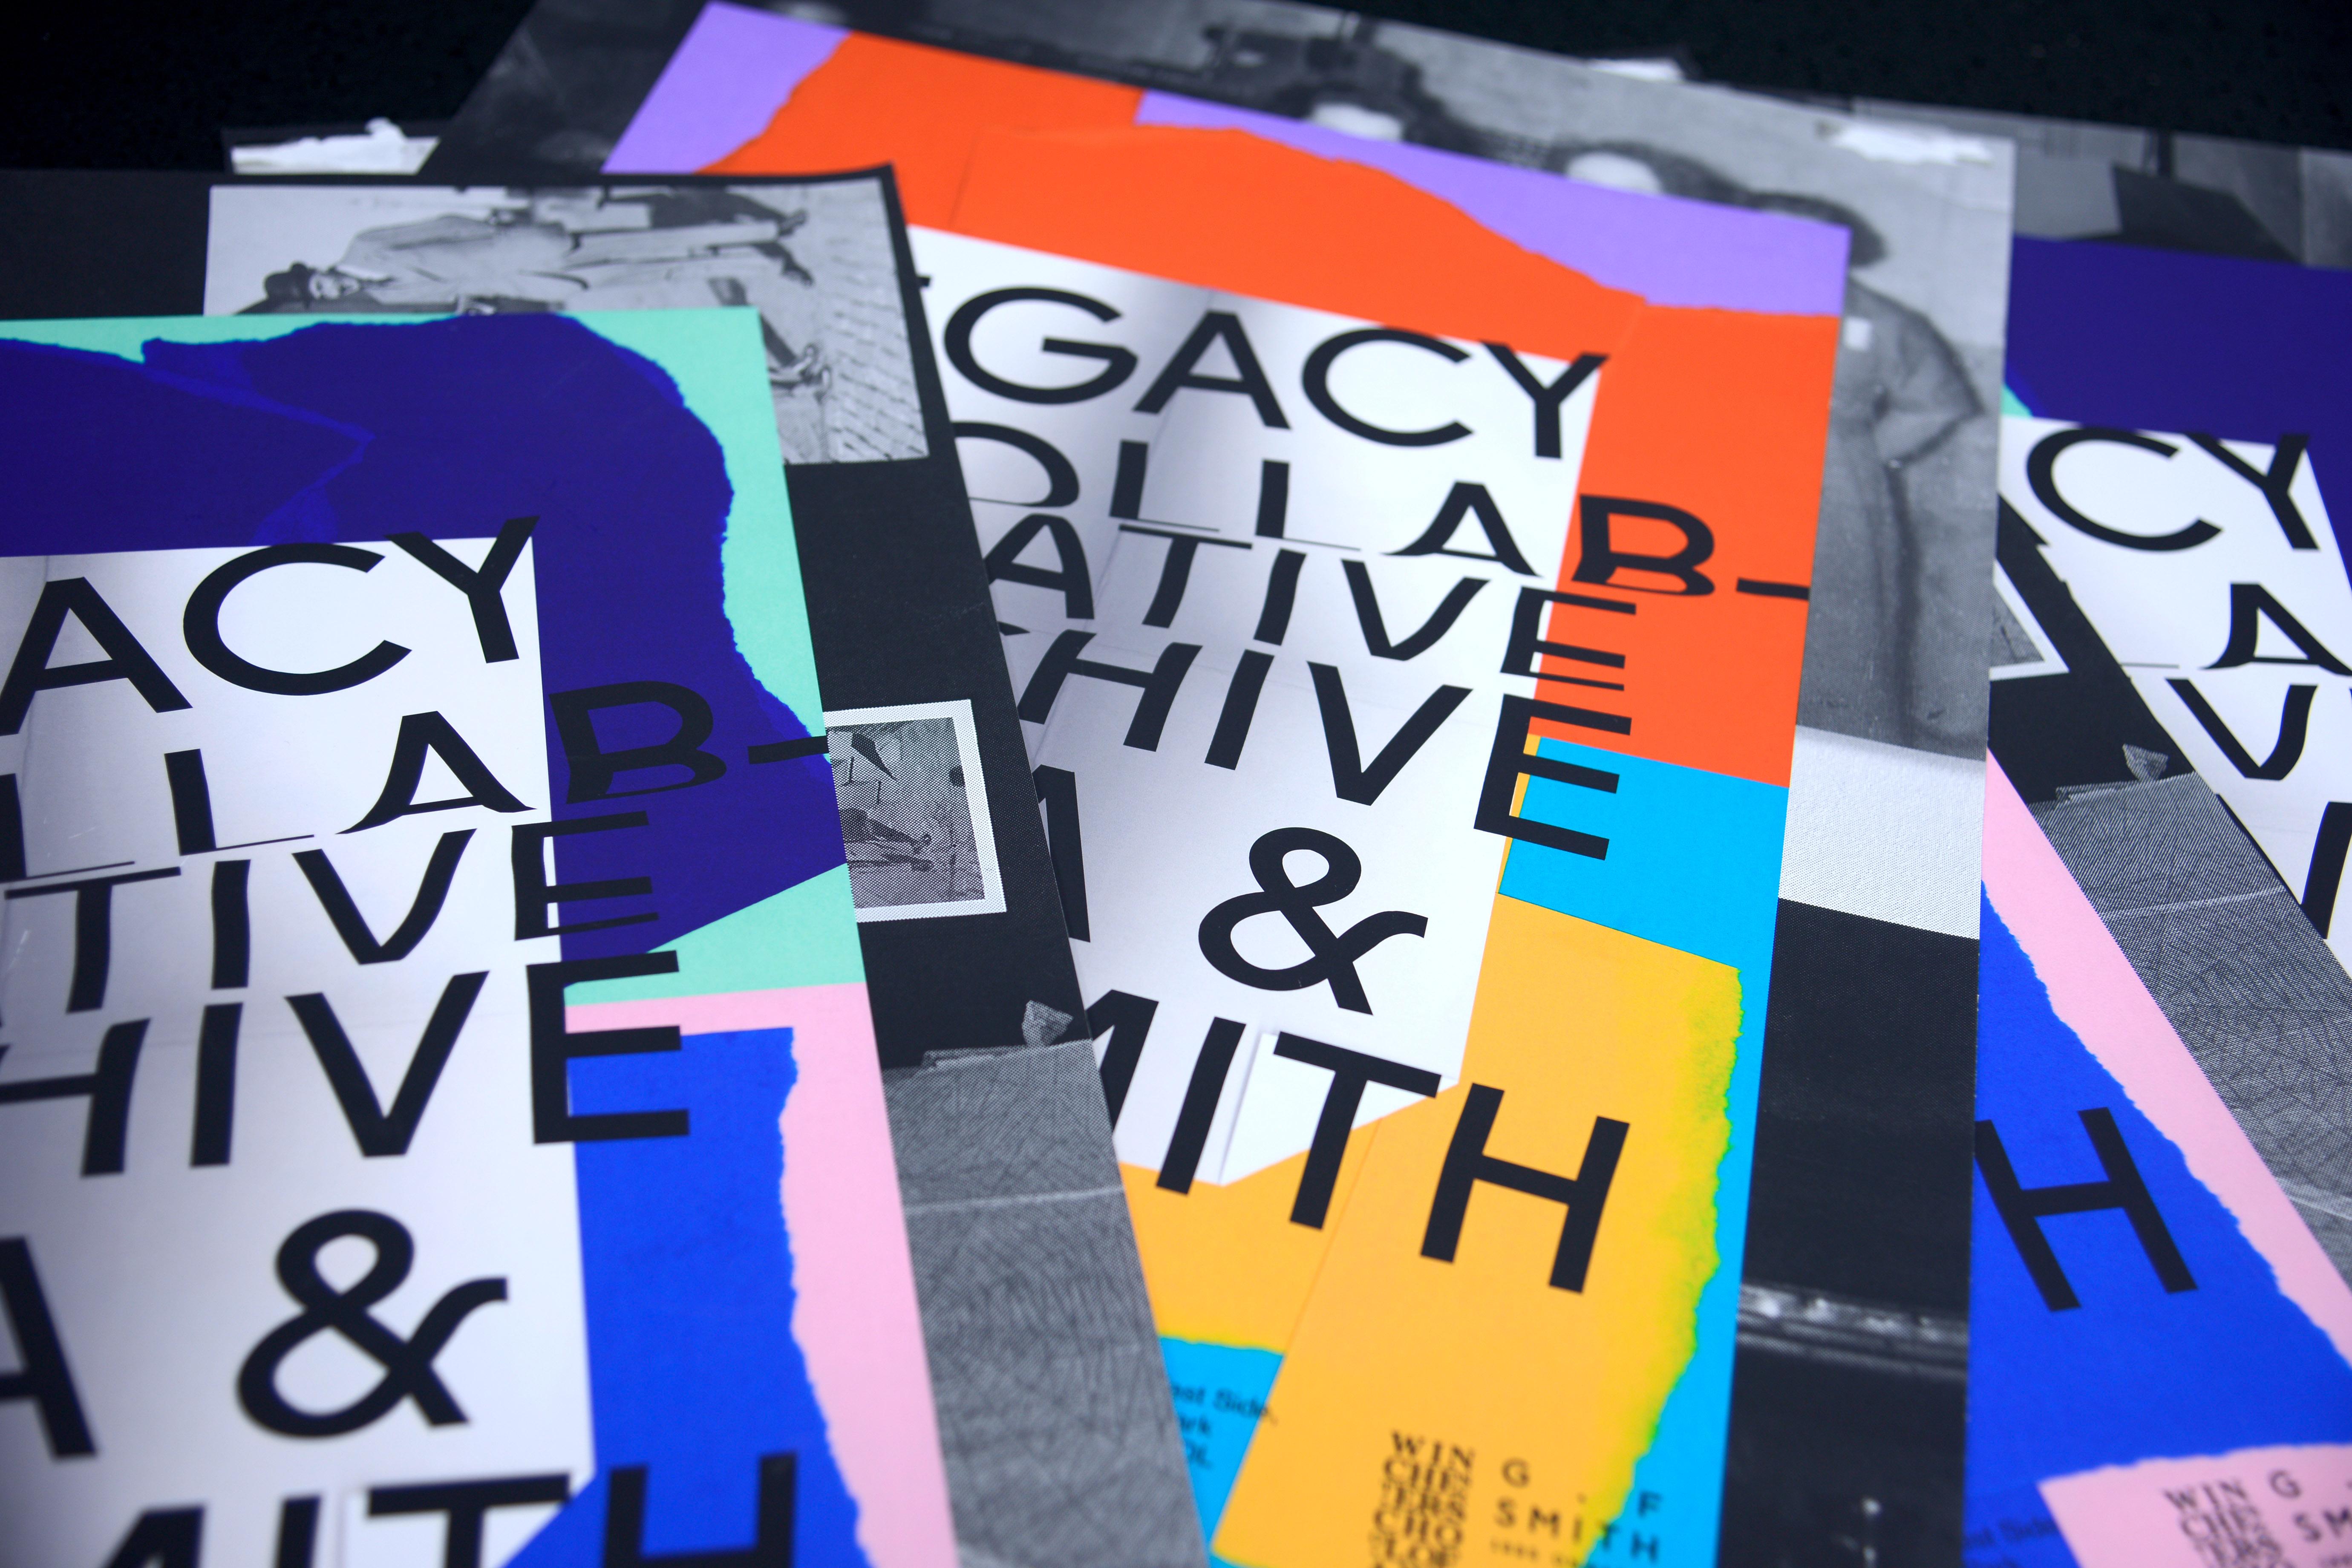 Legacy: A Collaborative Archive, WSA & G.F Smith